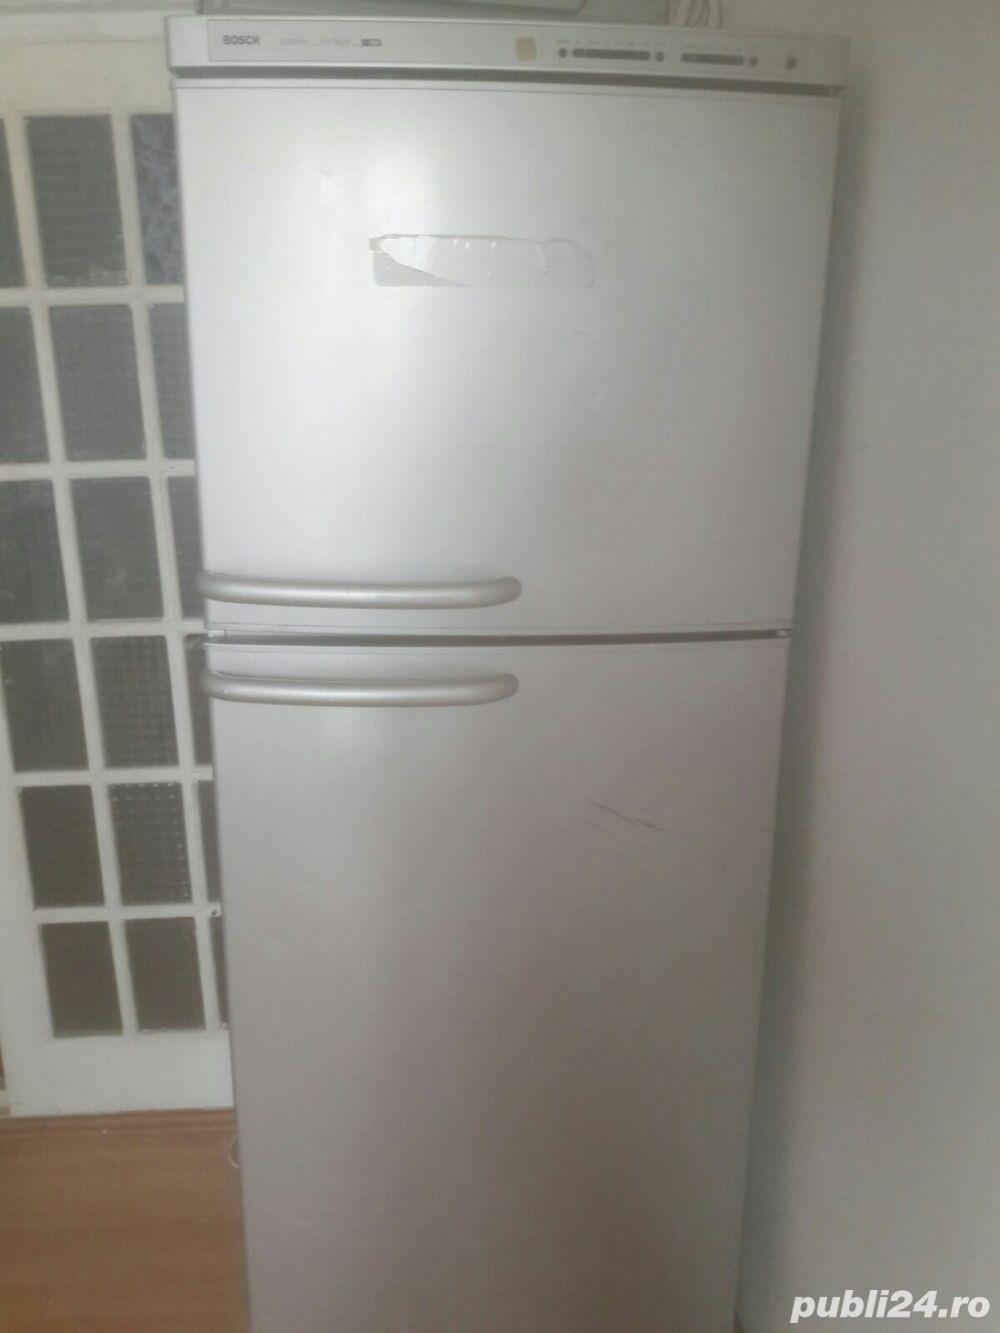 Propietar vand frigidere